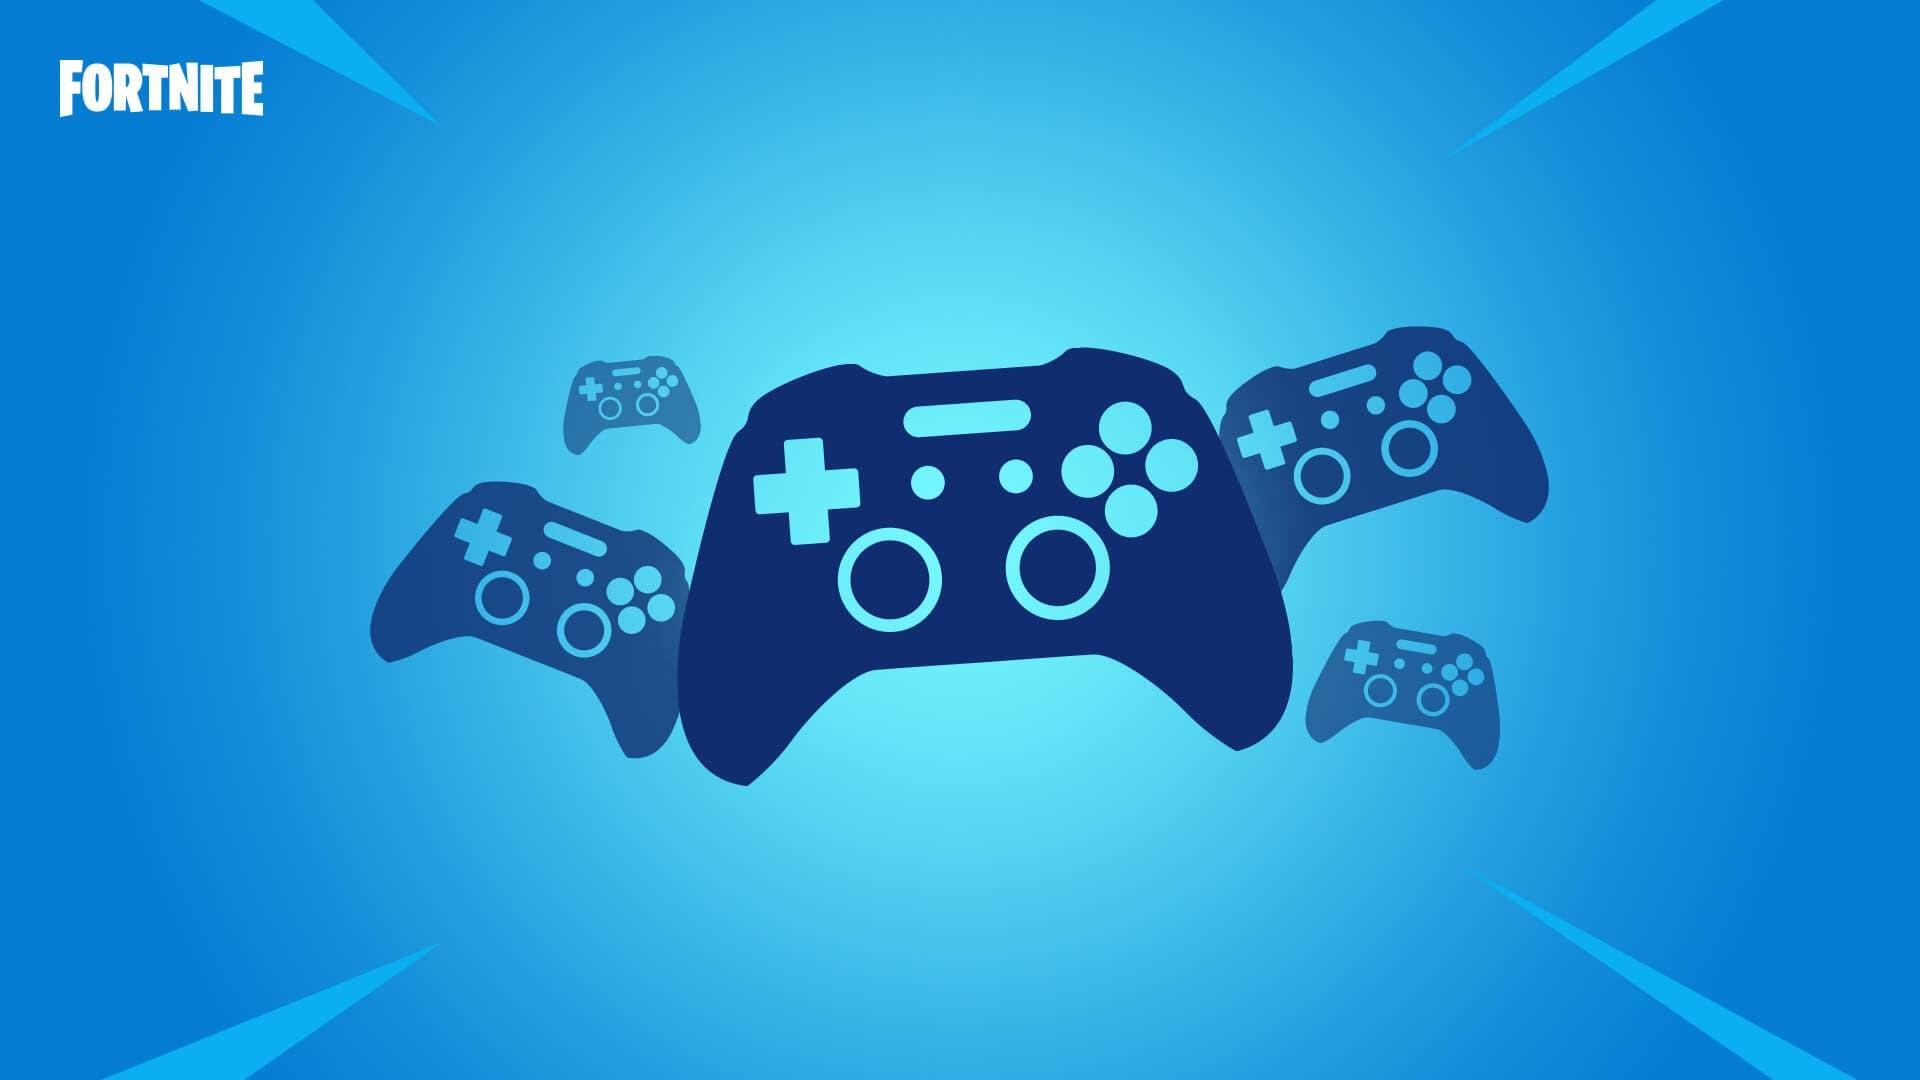 Gamepad Fortnite